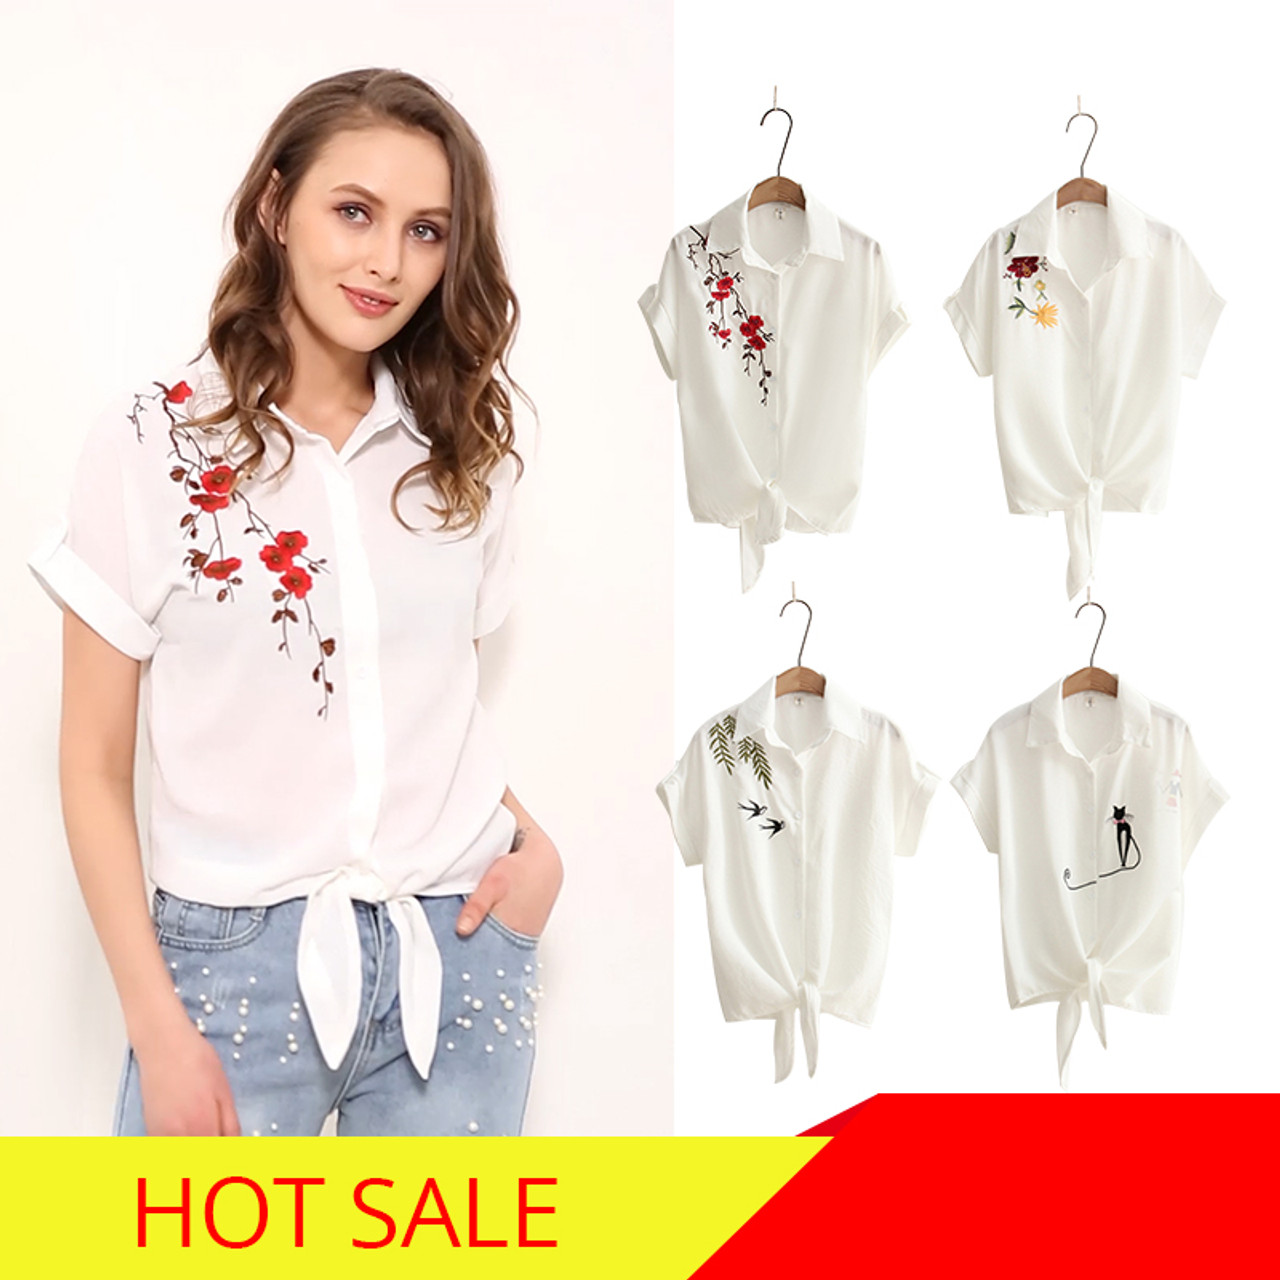 2019 Top Summer Women Casual Tops Short Sleeve Embroidery White Top Blouses Shirts Sexy Kimono Loose Beach Shirt Blusas Feminina Women's Clothing